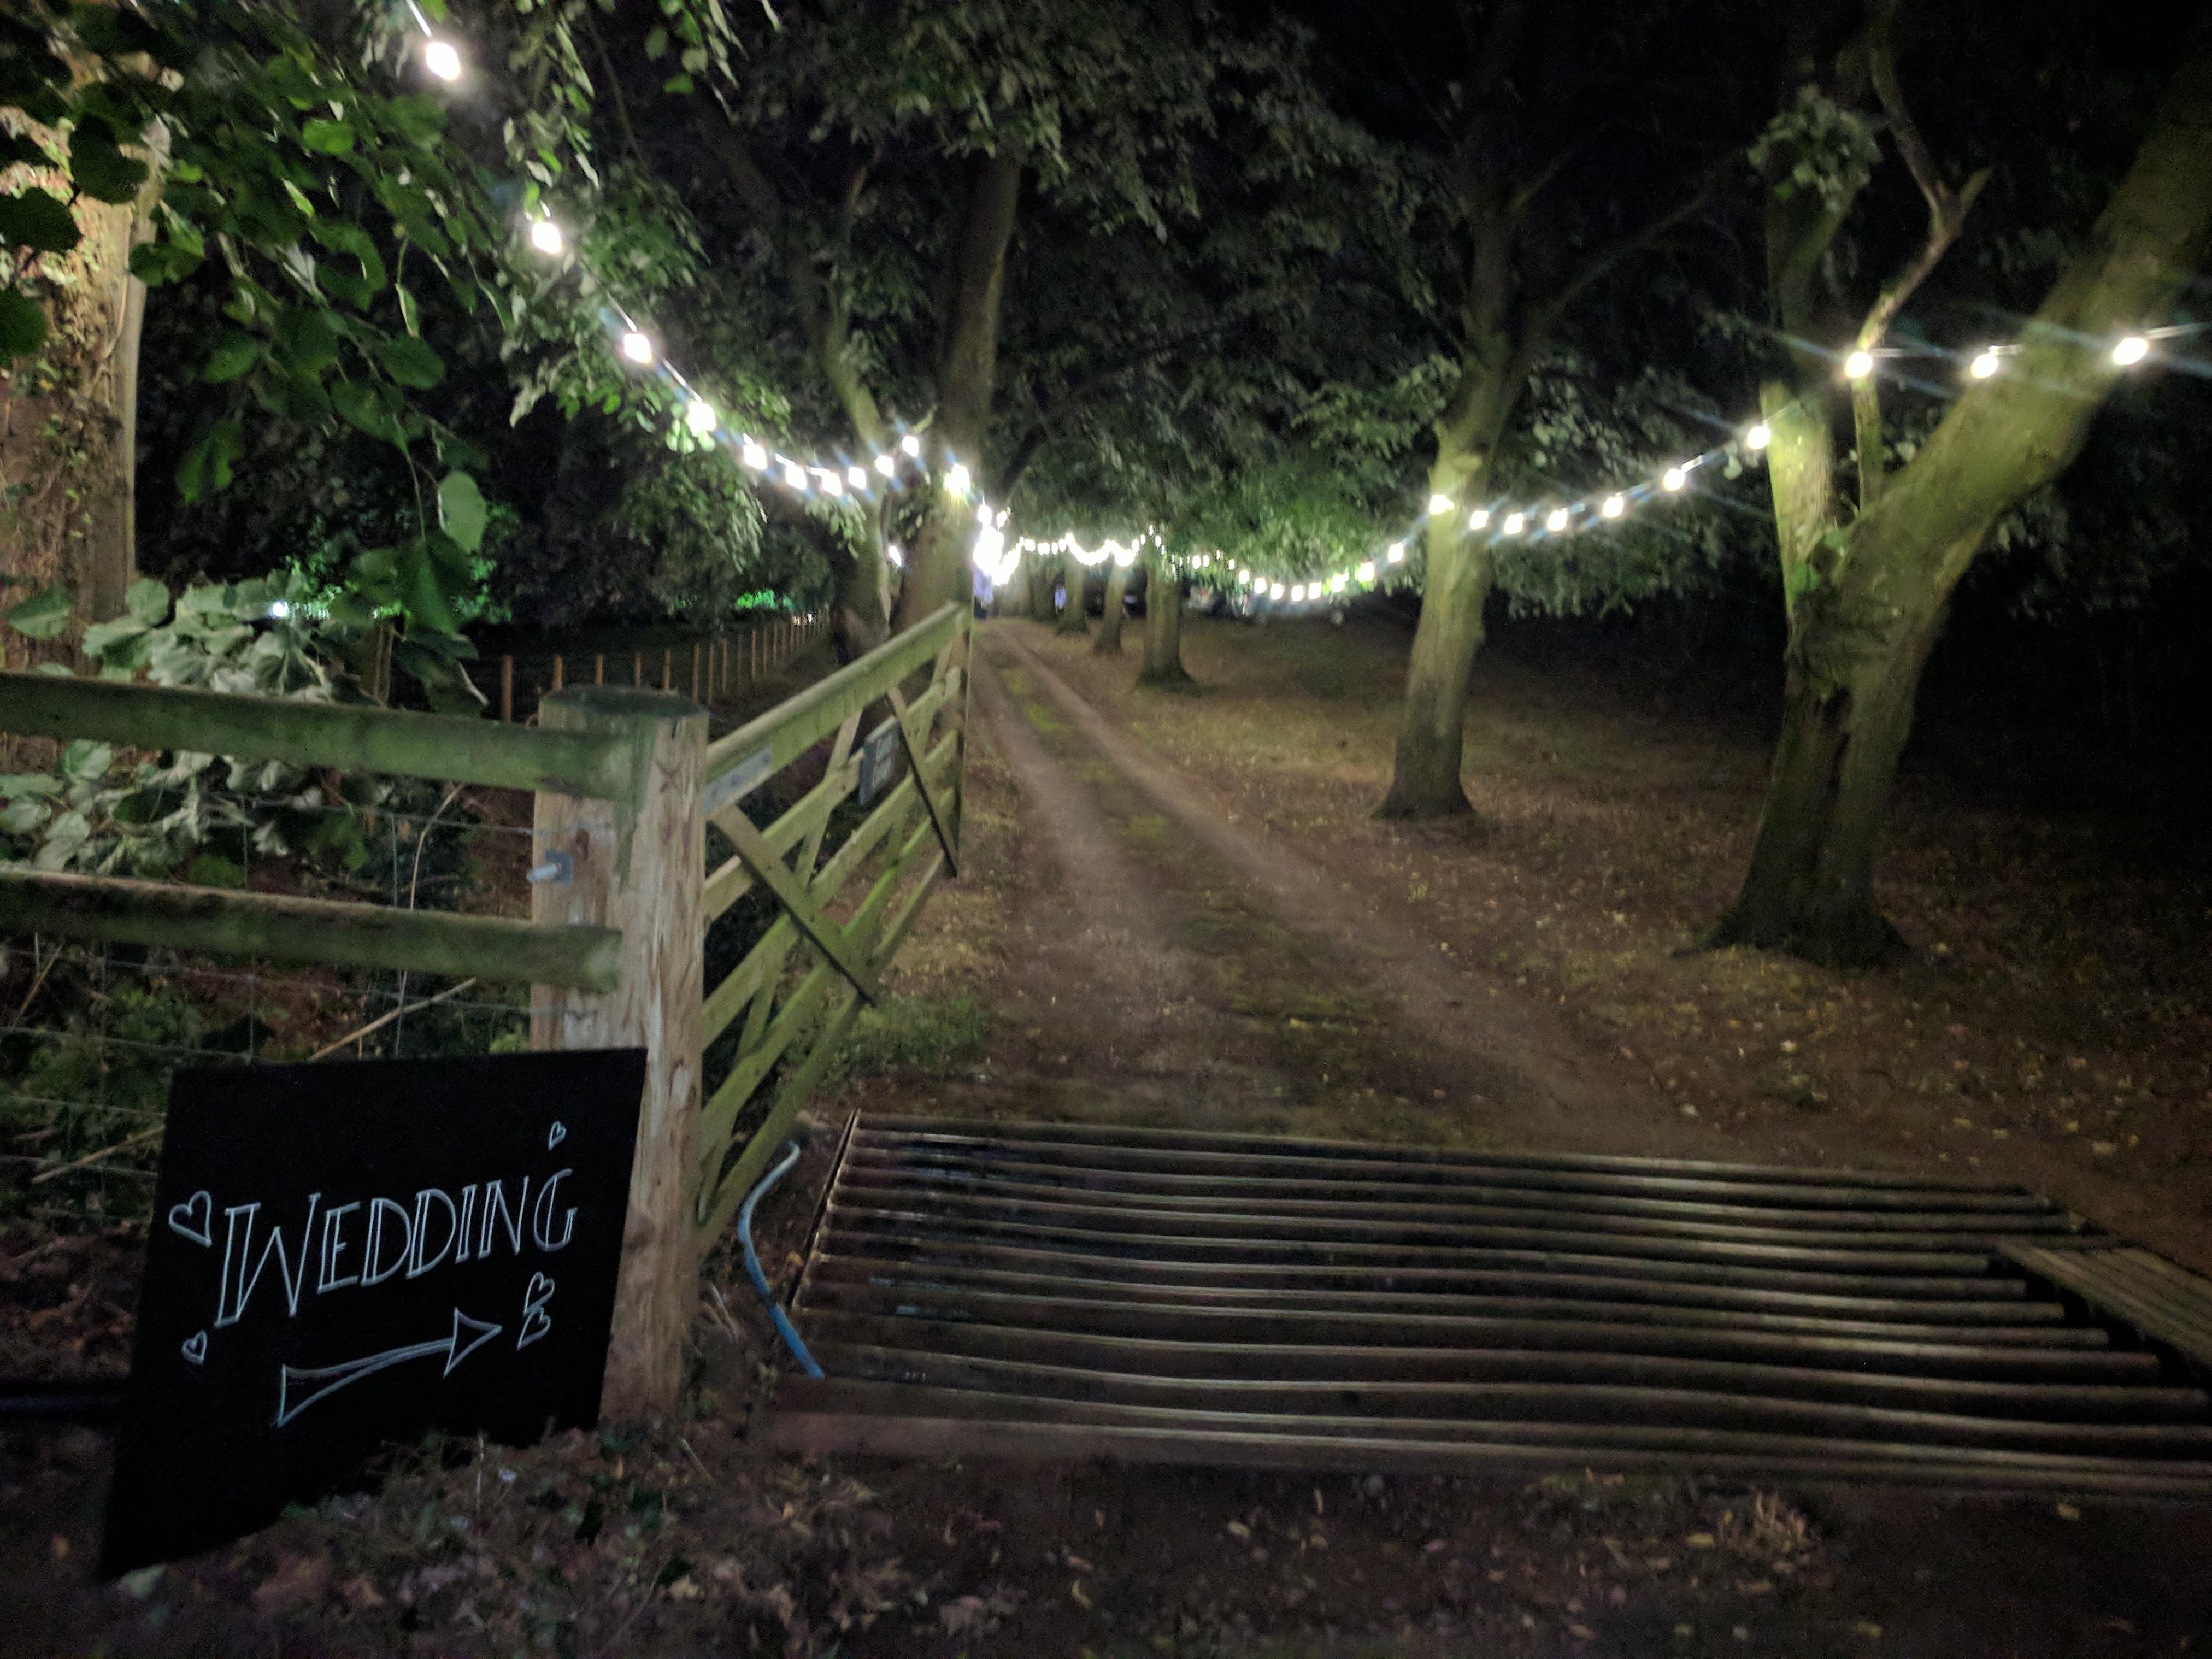 Festoon Lighting @ Wedding in Herefordshire